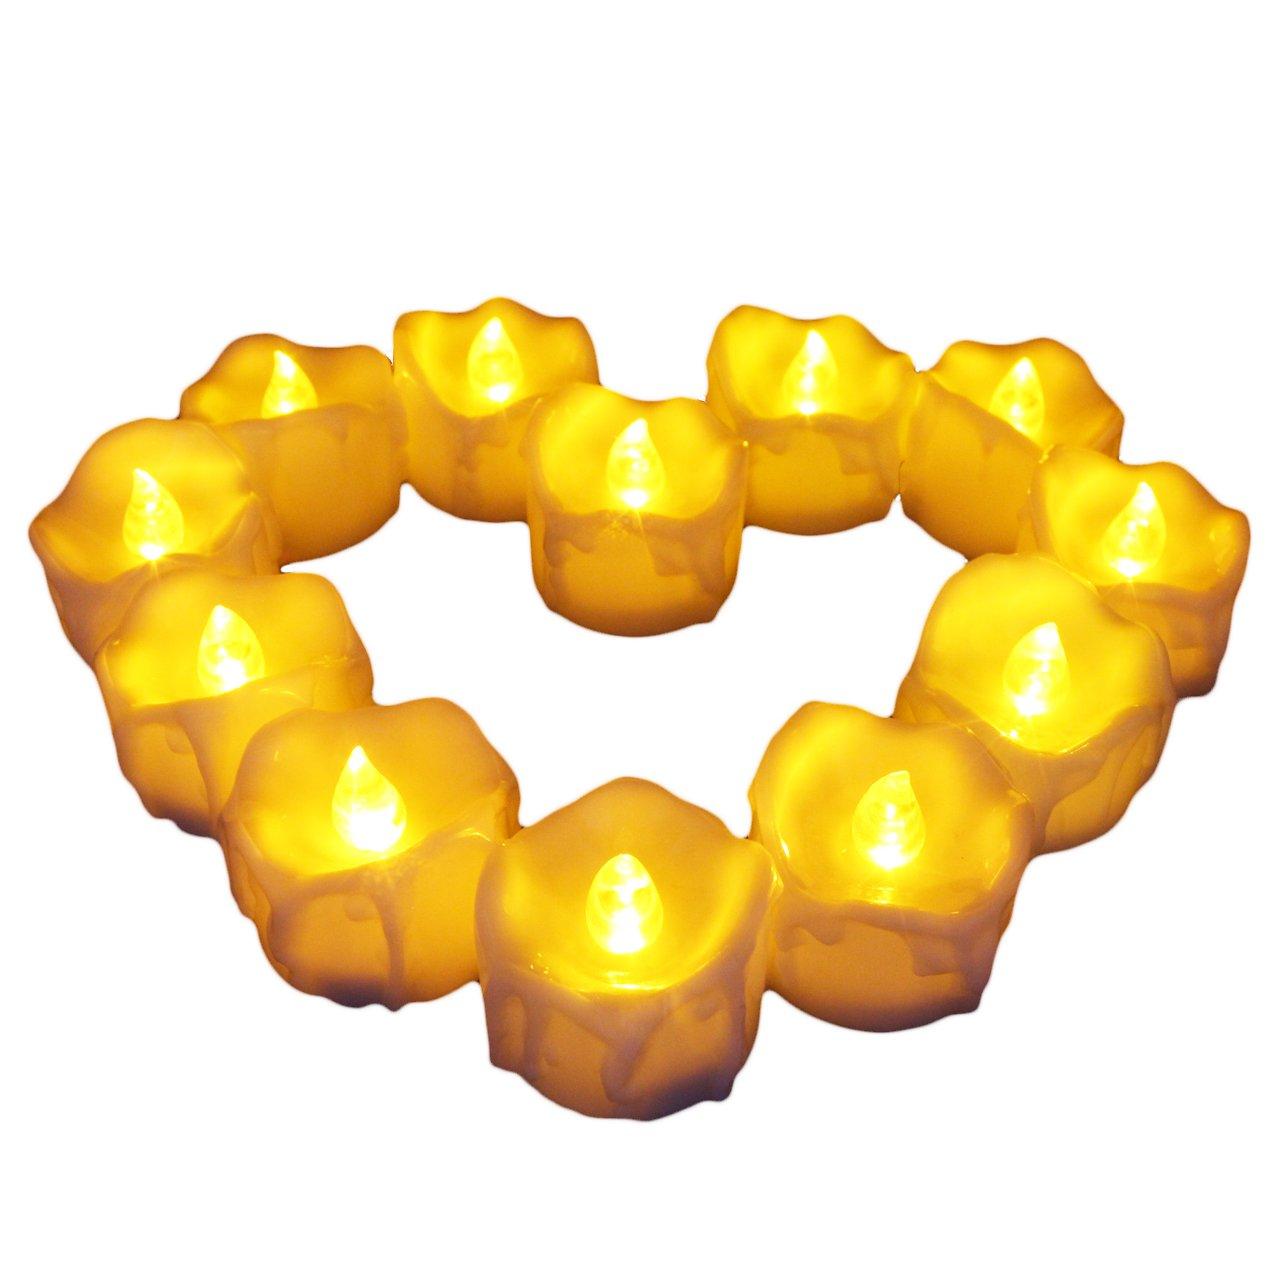 12pcs LEDティーライトの季節とFestival Celebrationリアルなちらつきcandles-amberイエロー、無香、flame-less、Battery Powered オレンジ TL01 B01KTZ2FDU 11320  オレンジ